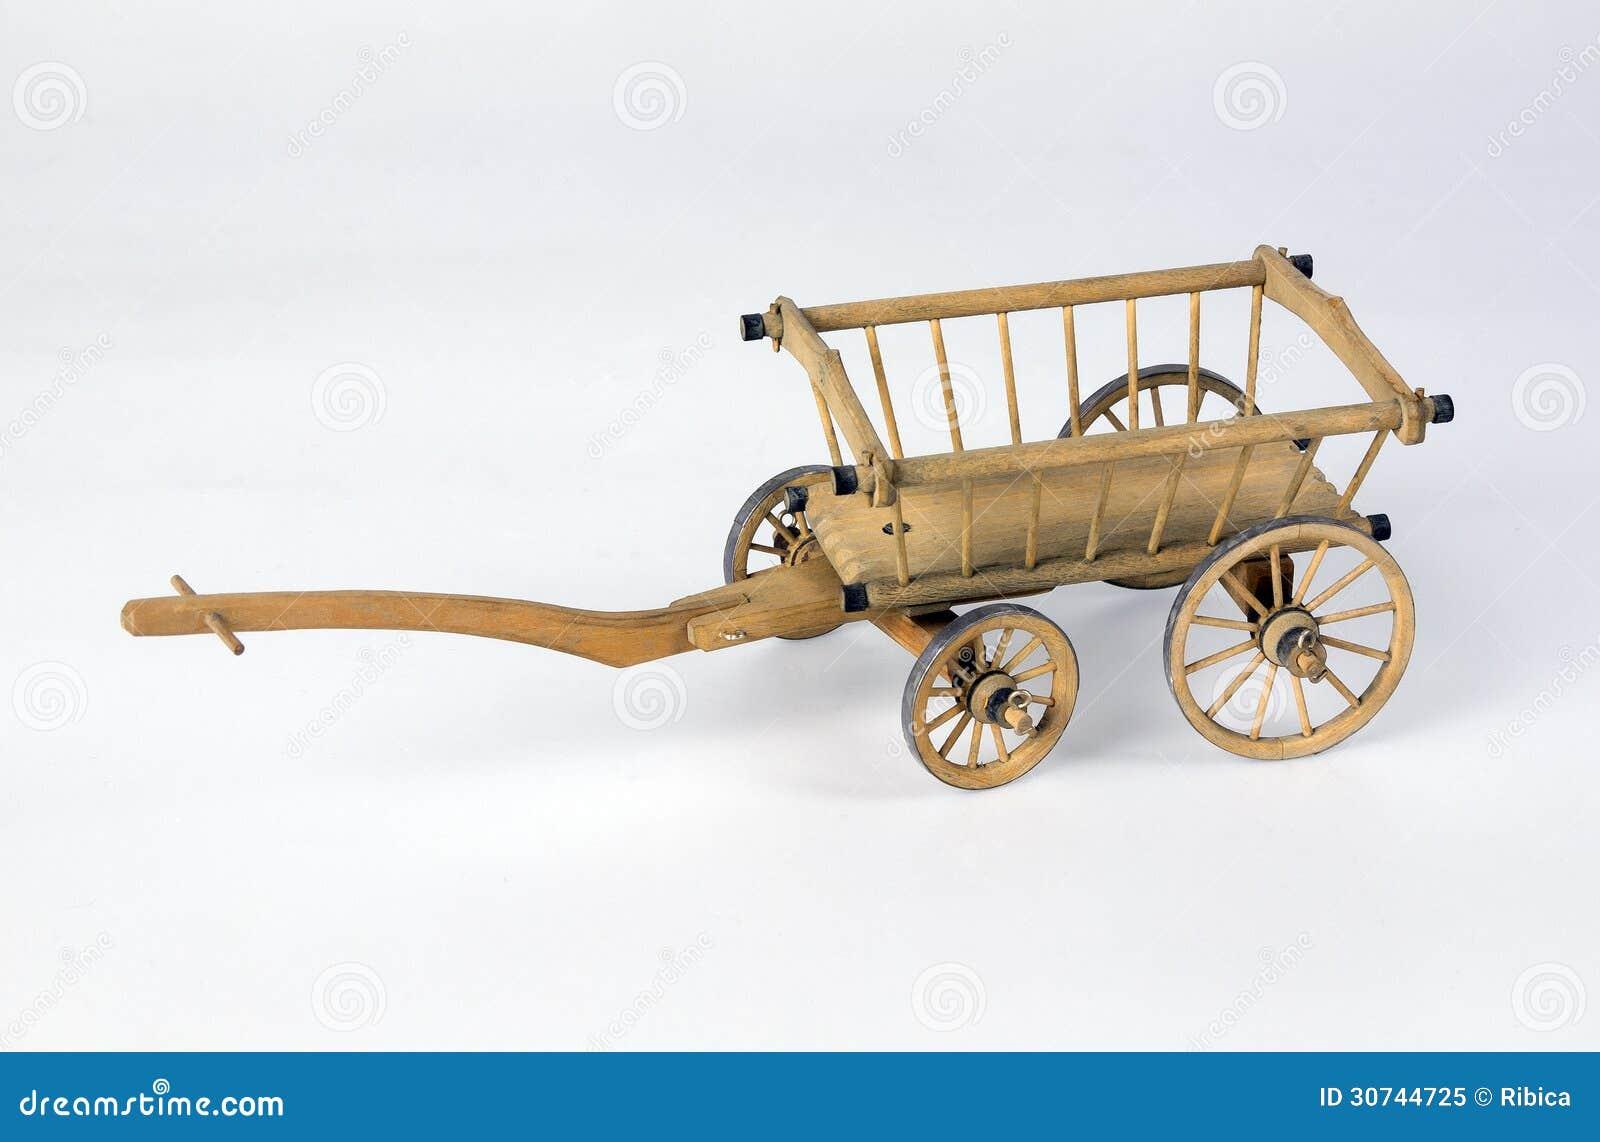 vieux chariot en bois image stock image du vieux weathered 30744725. Black Bedroom Furniture Sets. Home Design Ideas